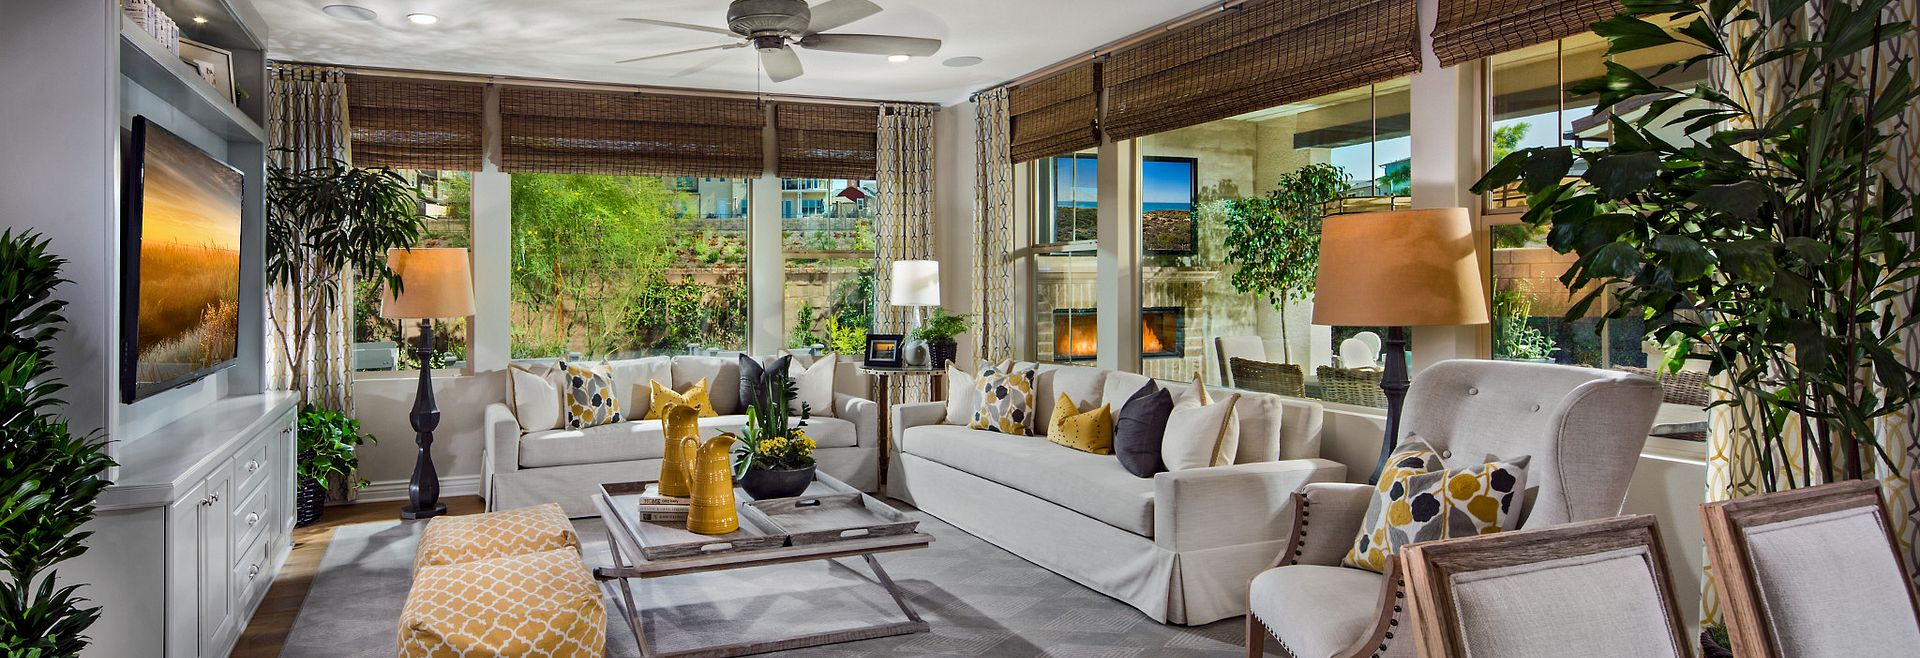 Cortesa Plan 2 Living Room